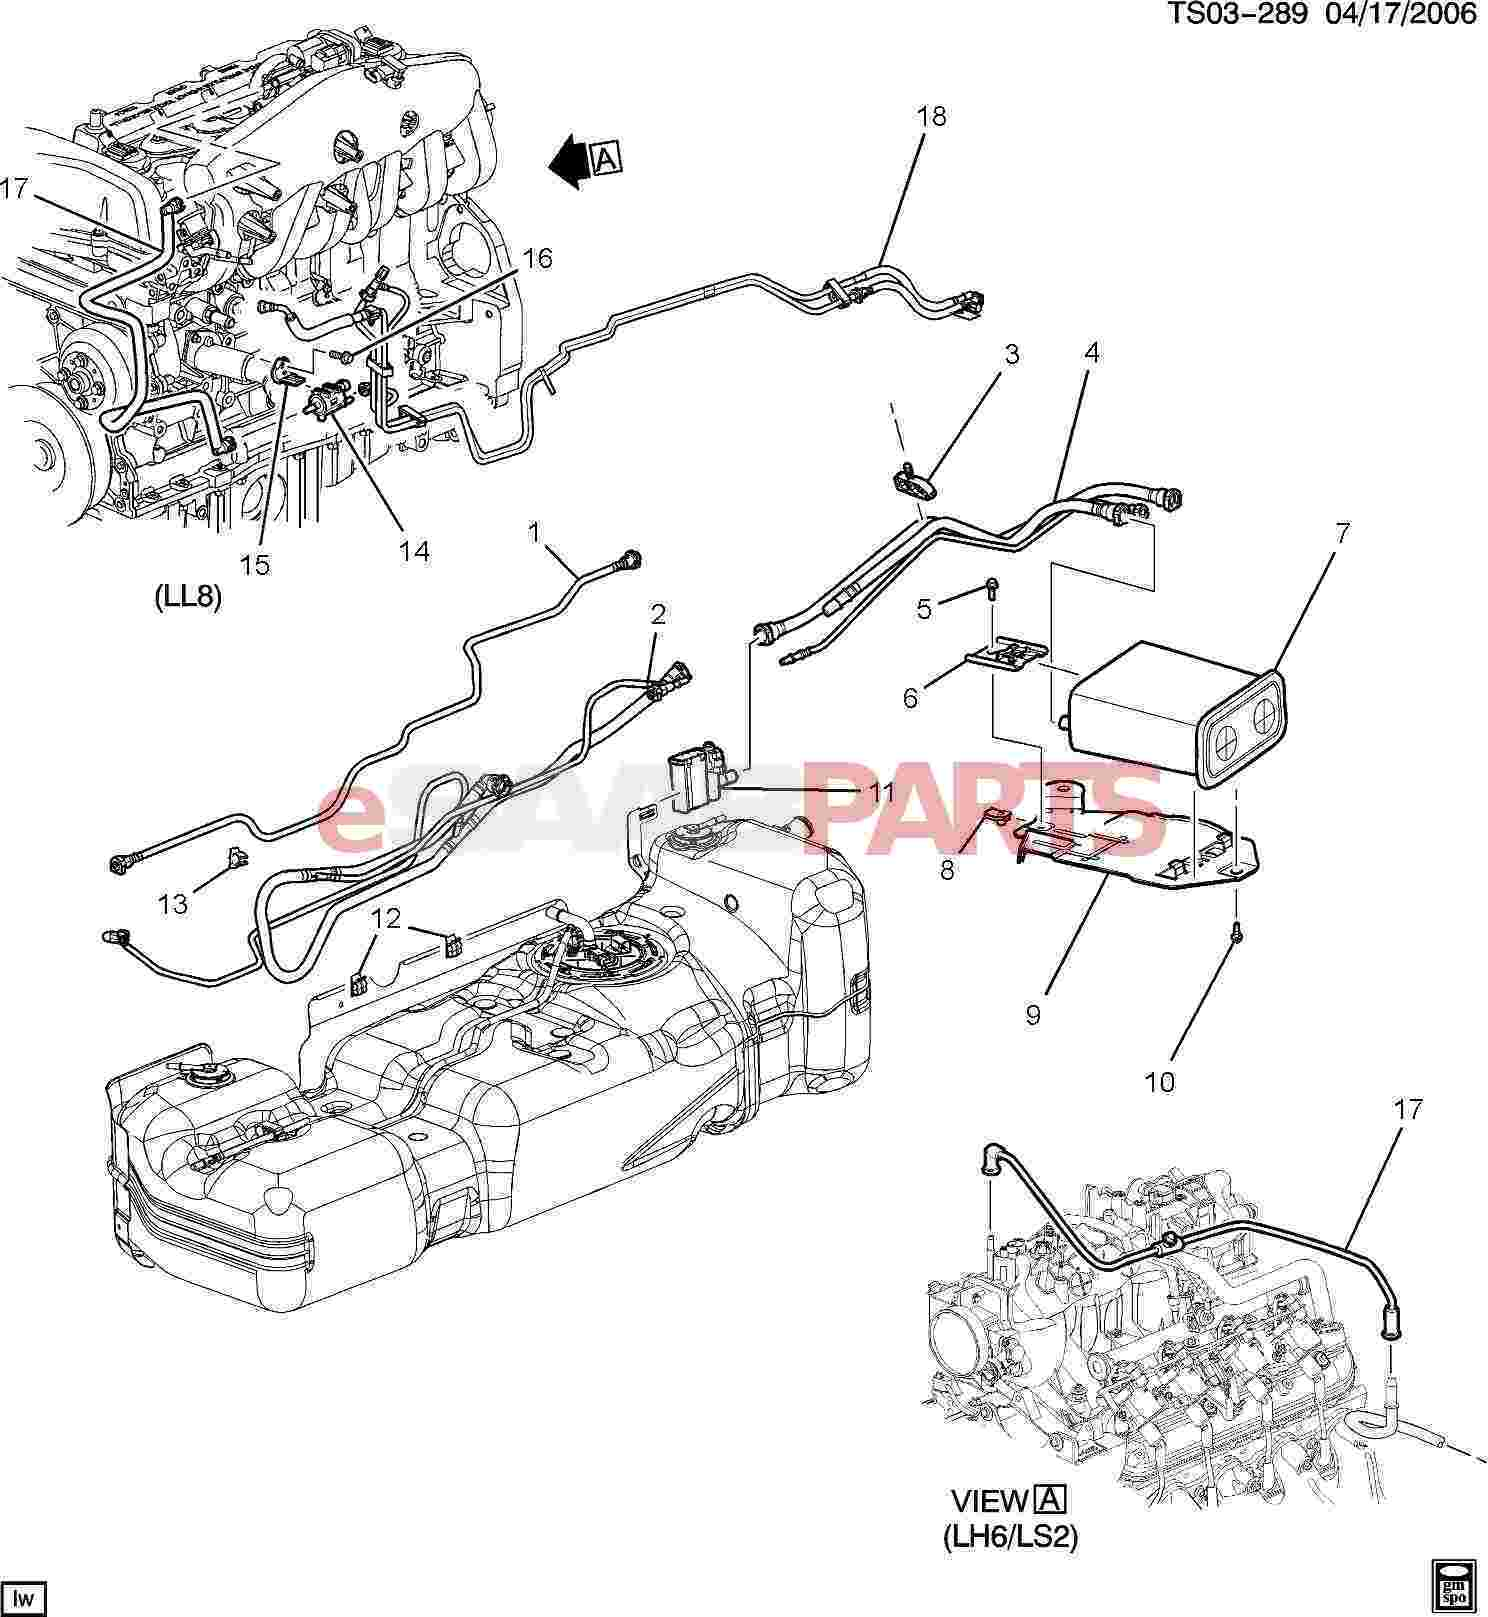 chevrolet trailblazer gas tank parts